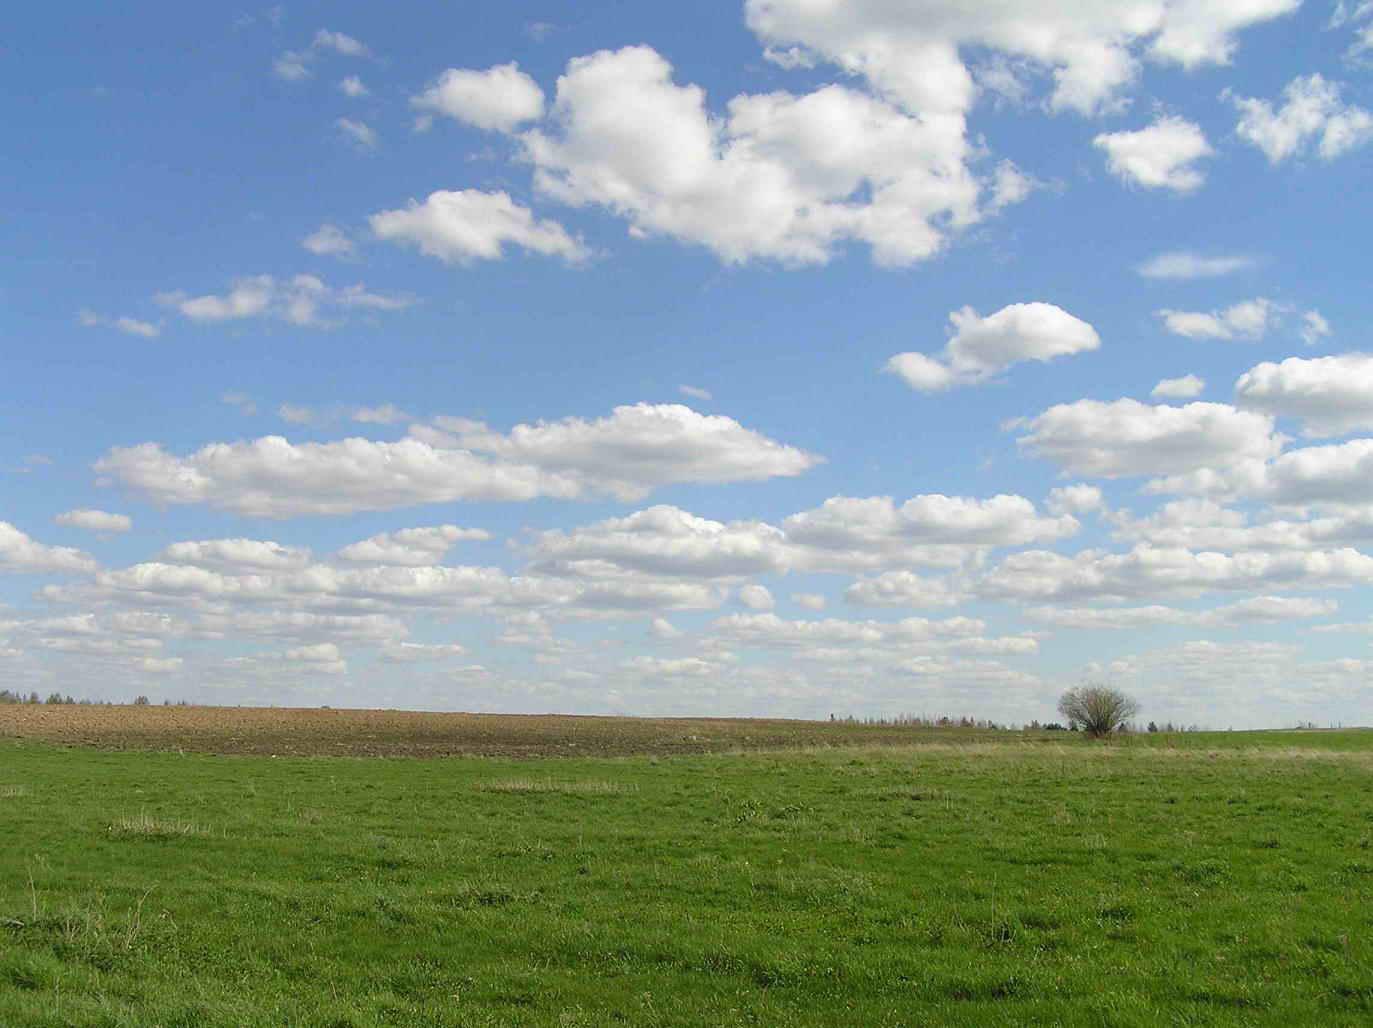 облака облака картинки кучевые